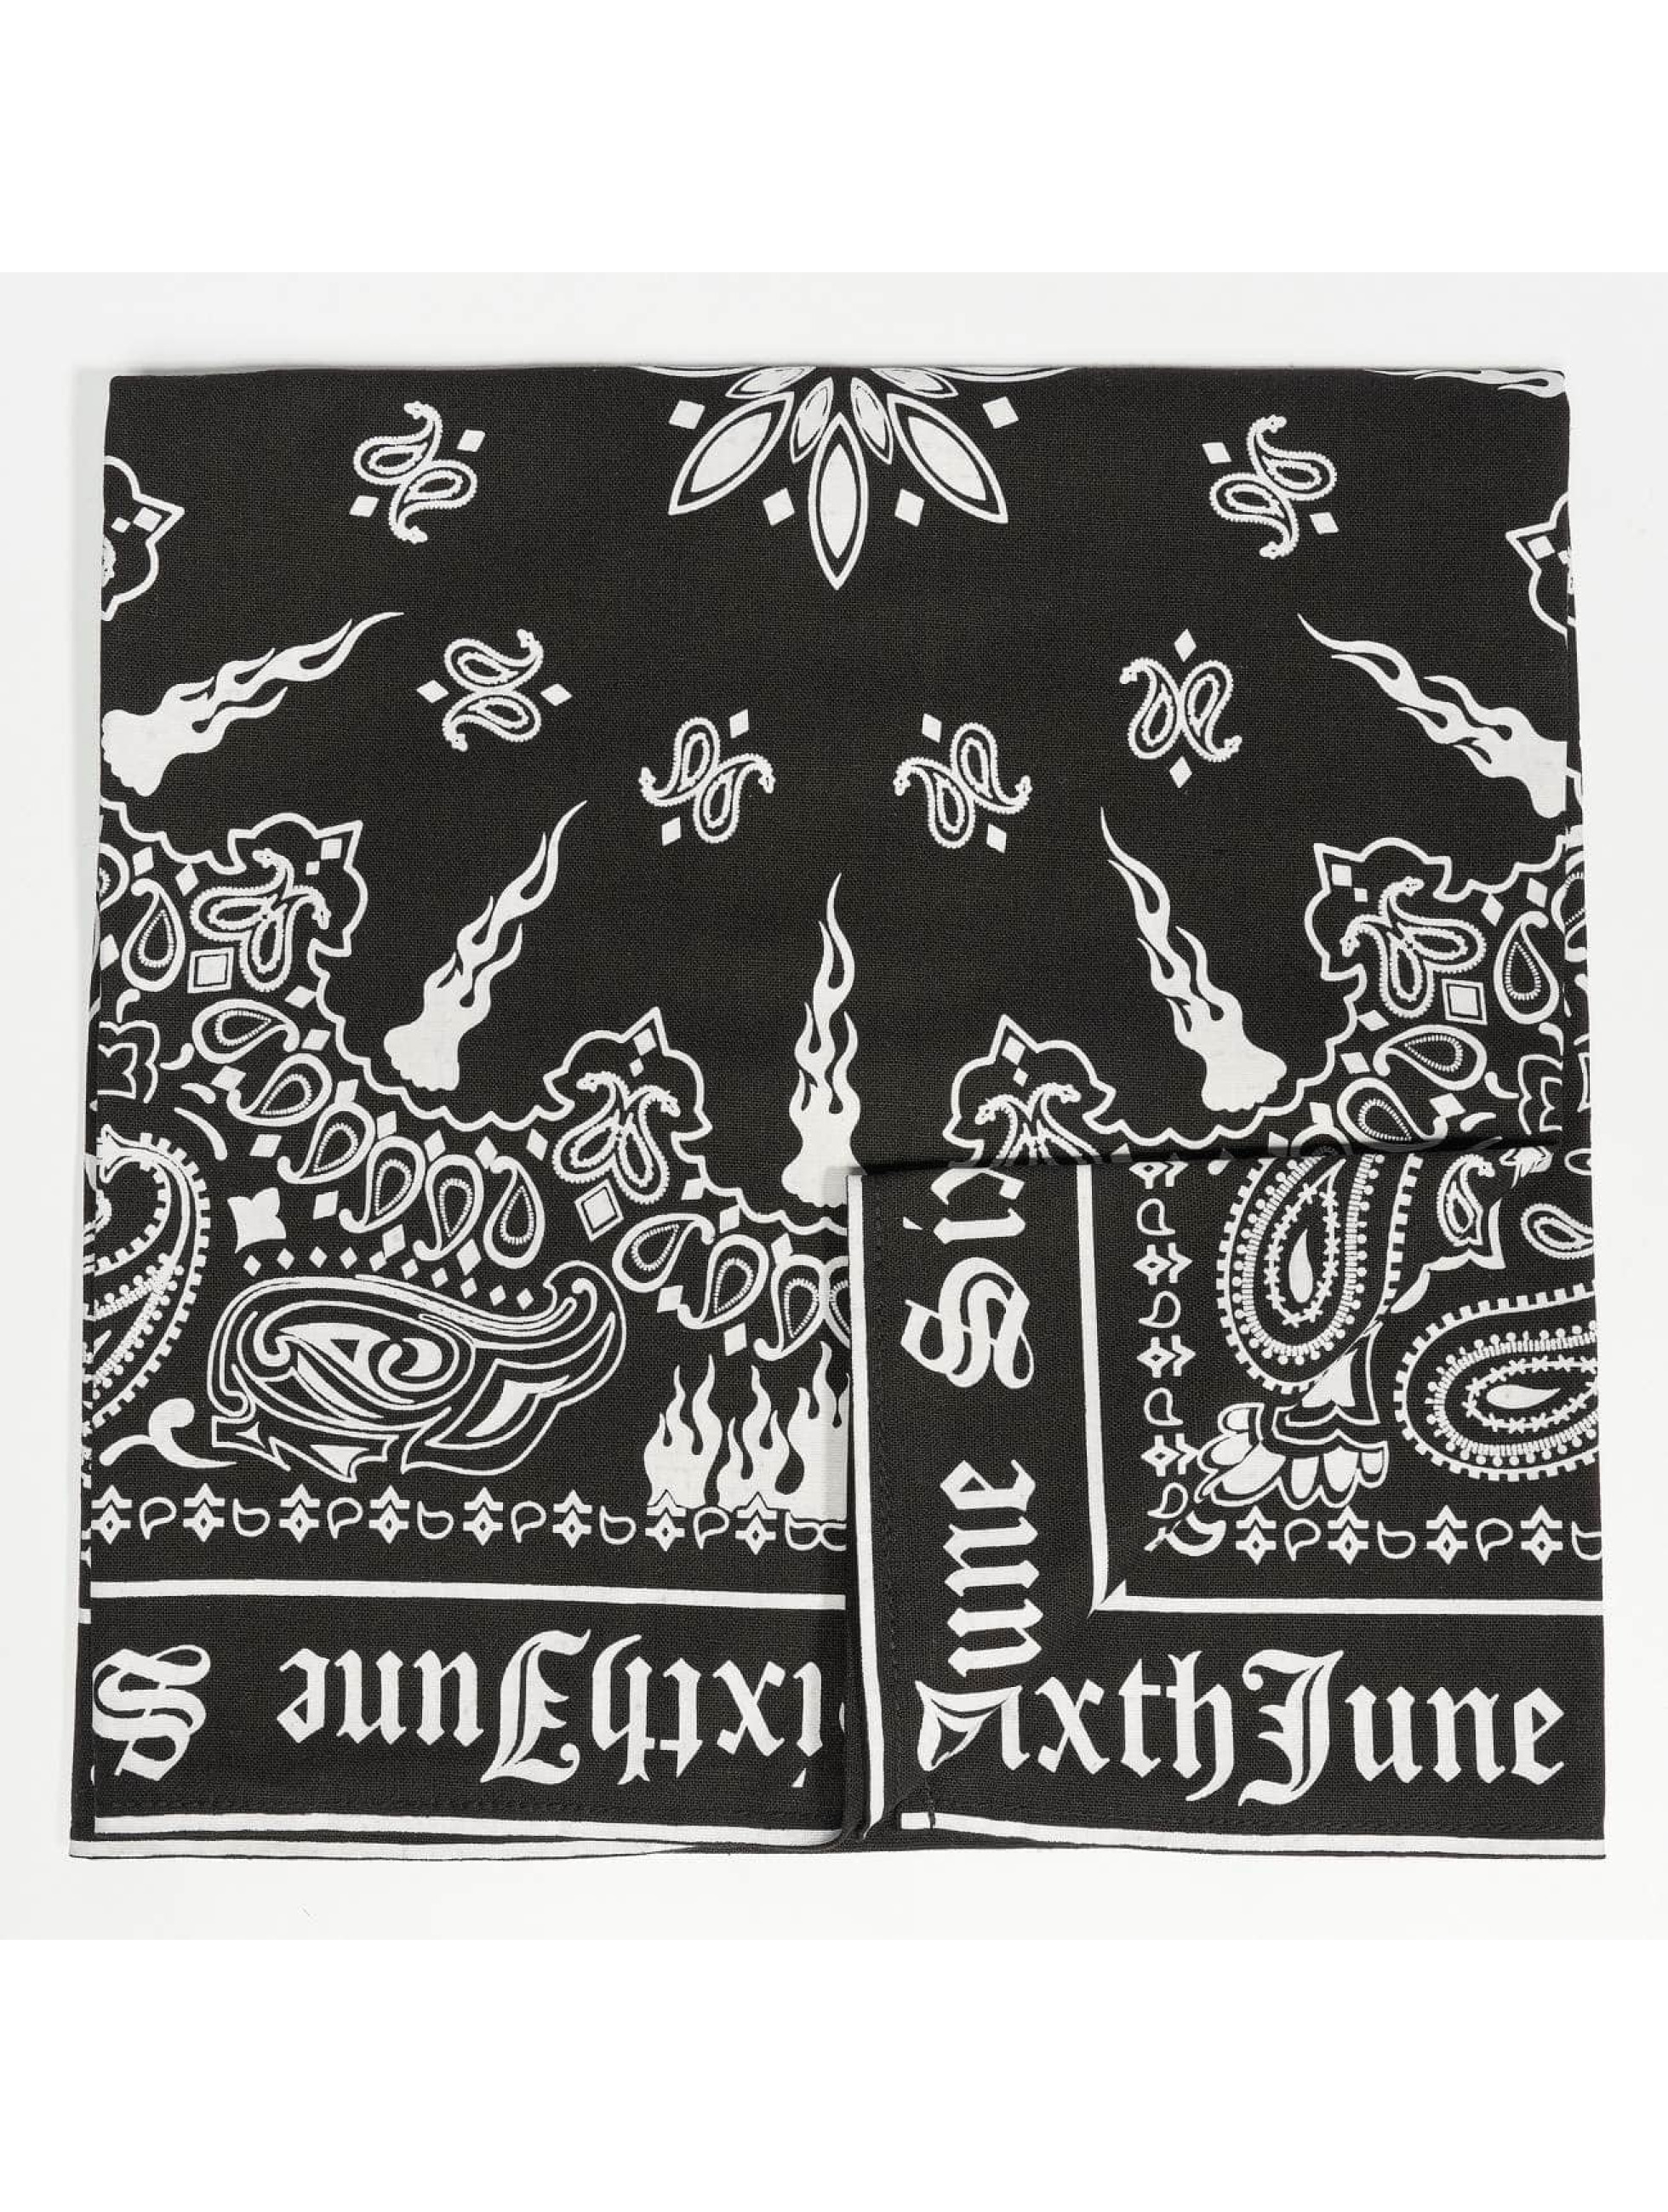 Sixth June Bandana/Durag Bandana black